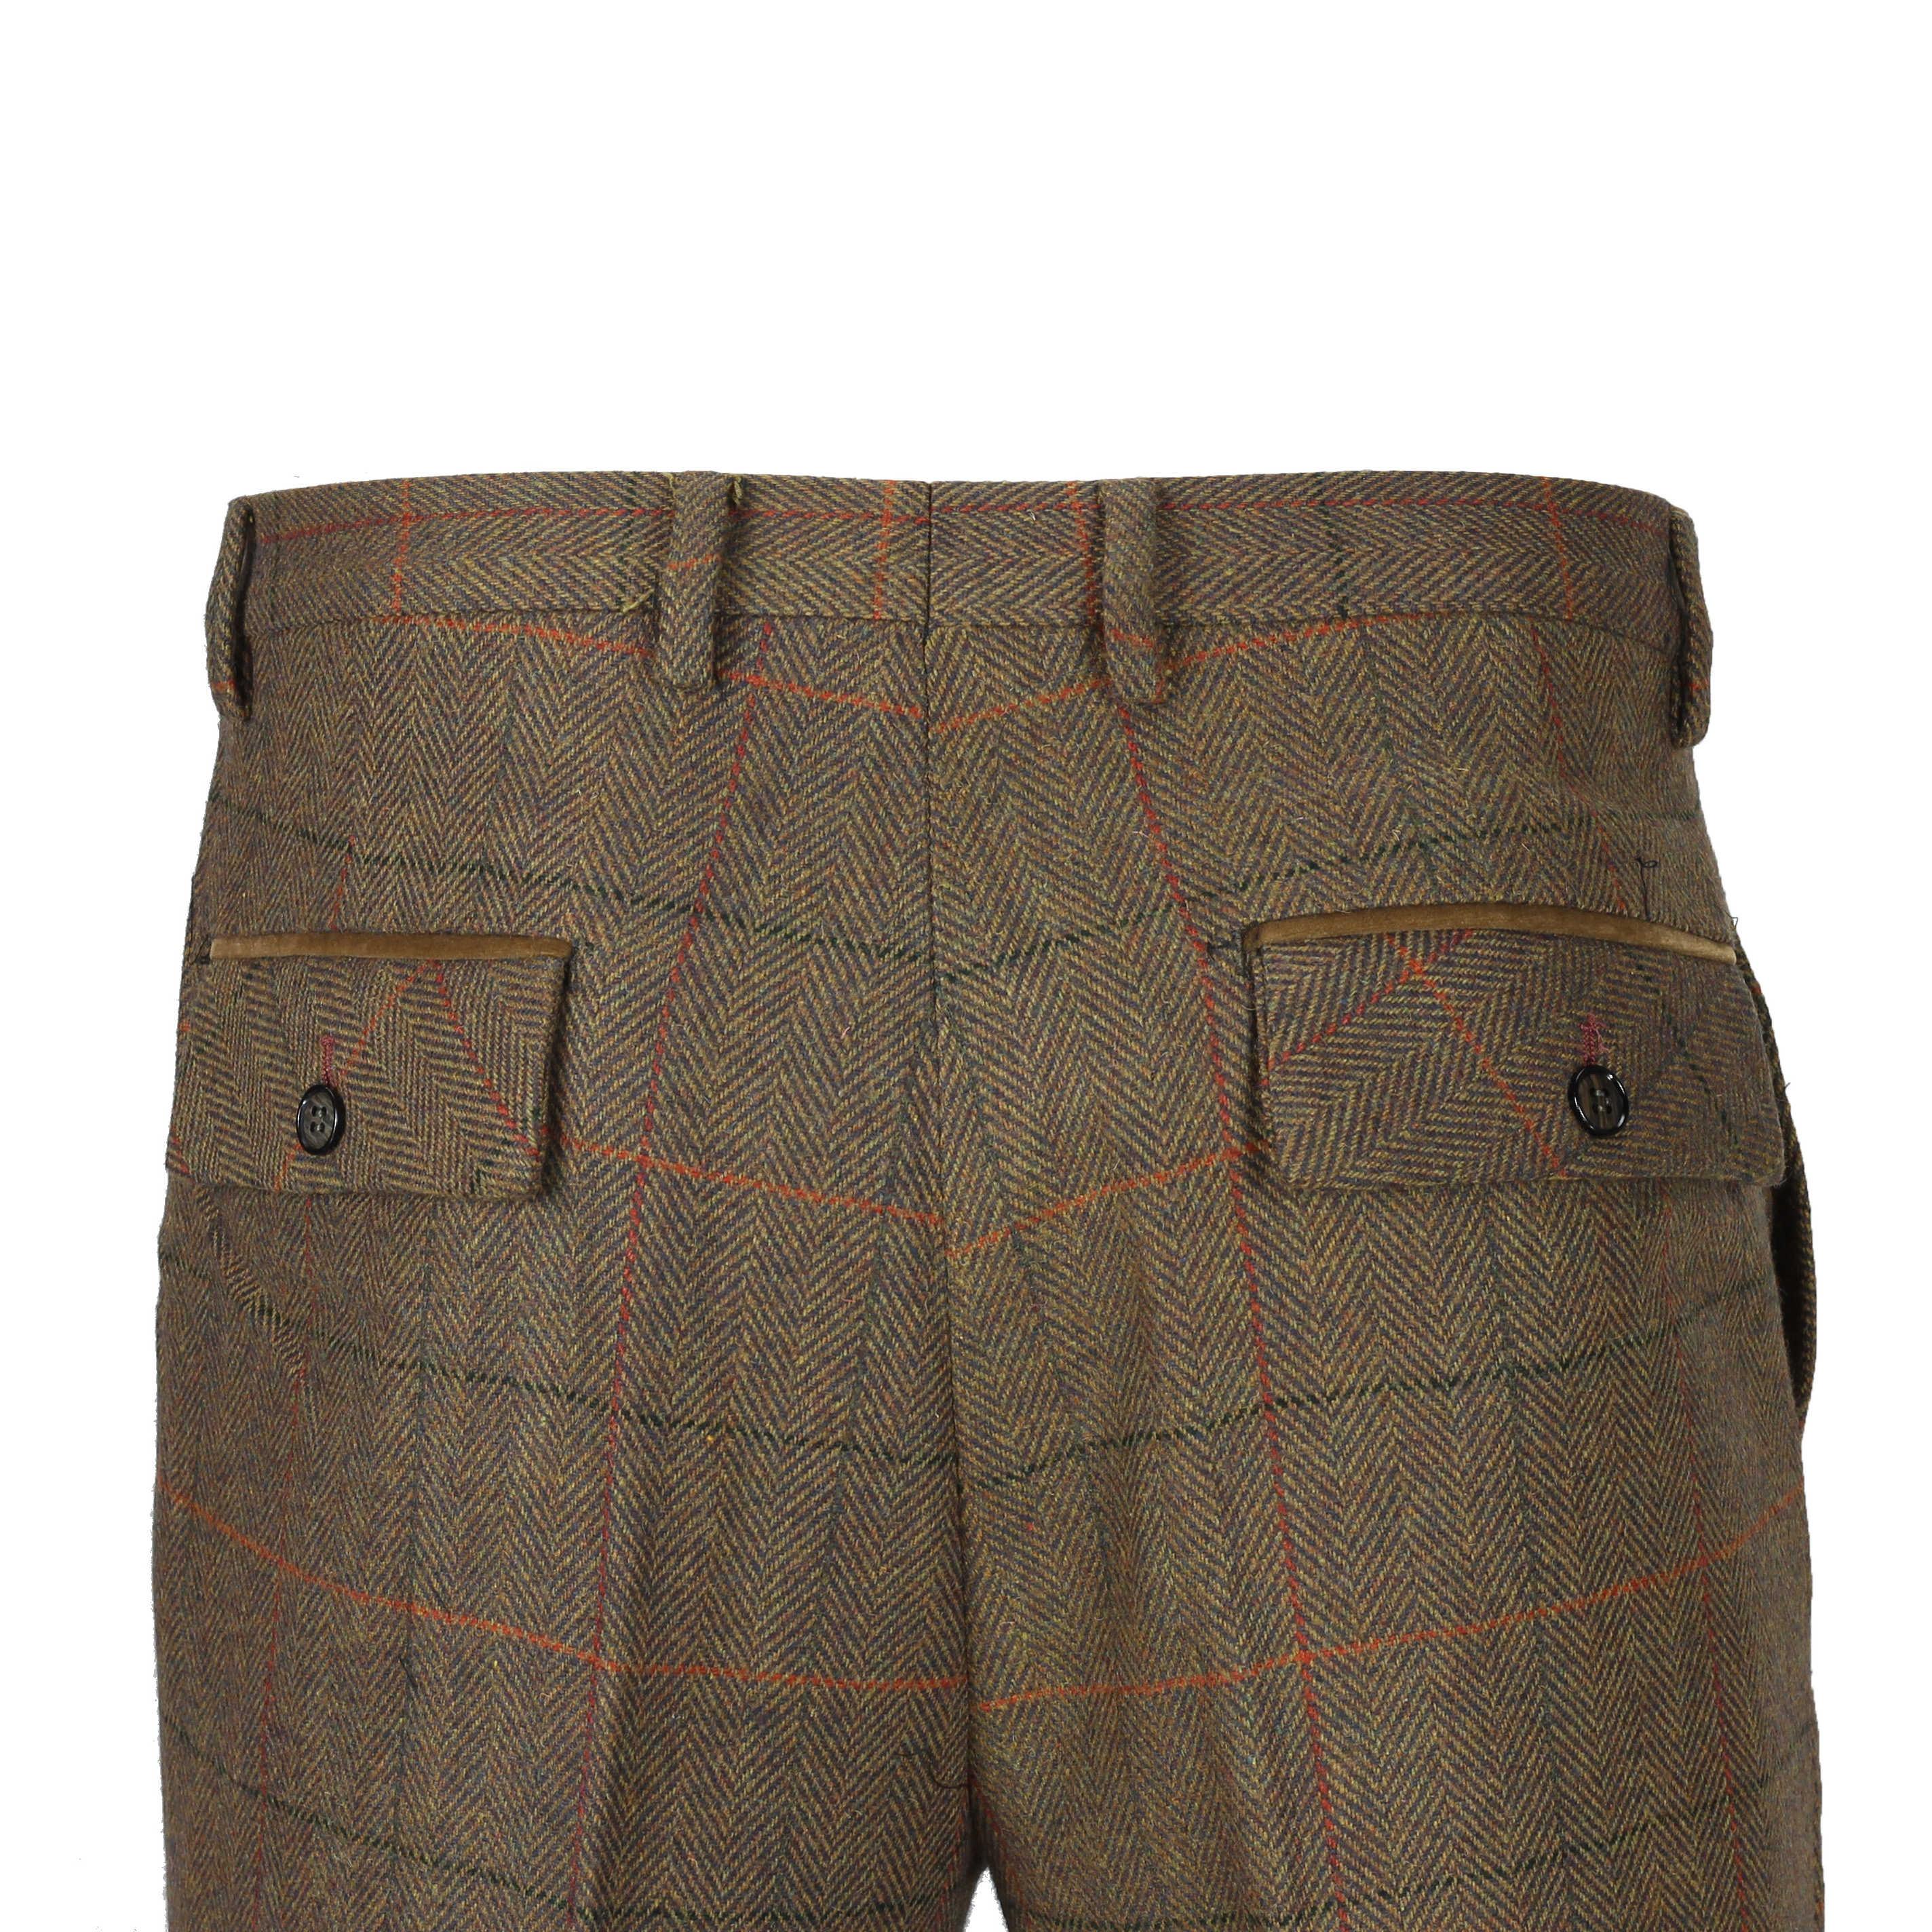 Mens-3-piezas-tan-comprueba-Herringbone-Traje-Blazer-Chaleco-Pantalones-Se-Venden-Por-Separado miniatura 12